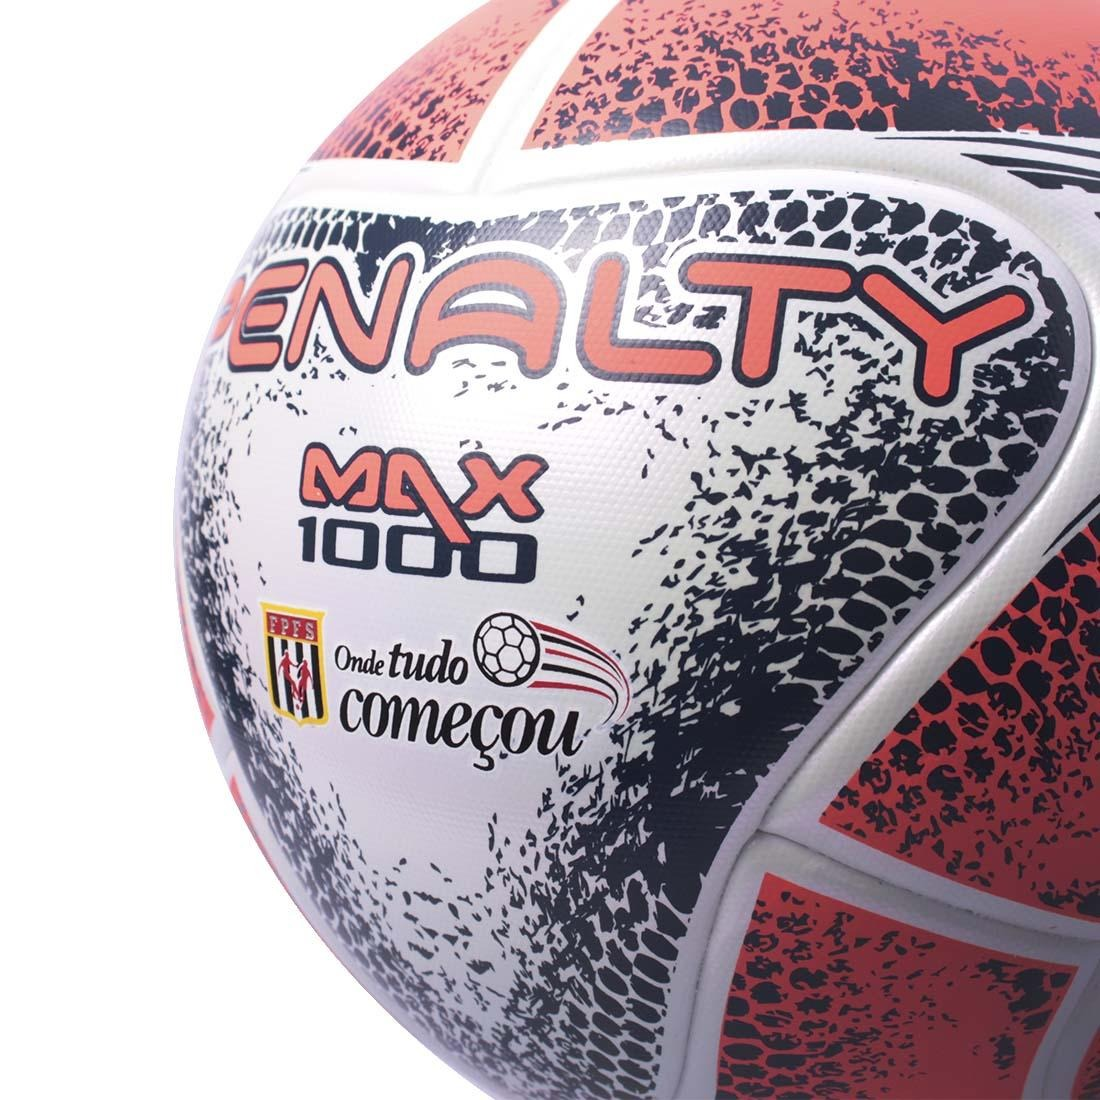 d3f1604edd bola futsal penalty max 1000 aprovada fifa 2018 original. Carregando  zoom... bola futsal penalty. Carregando zoom.